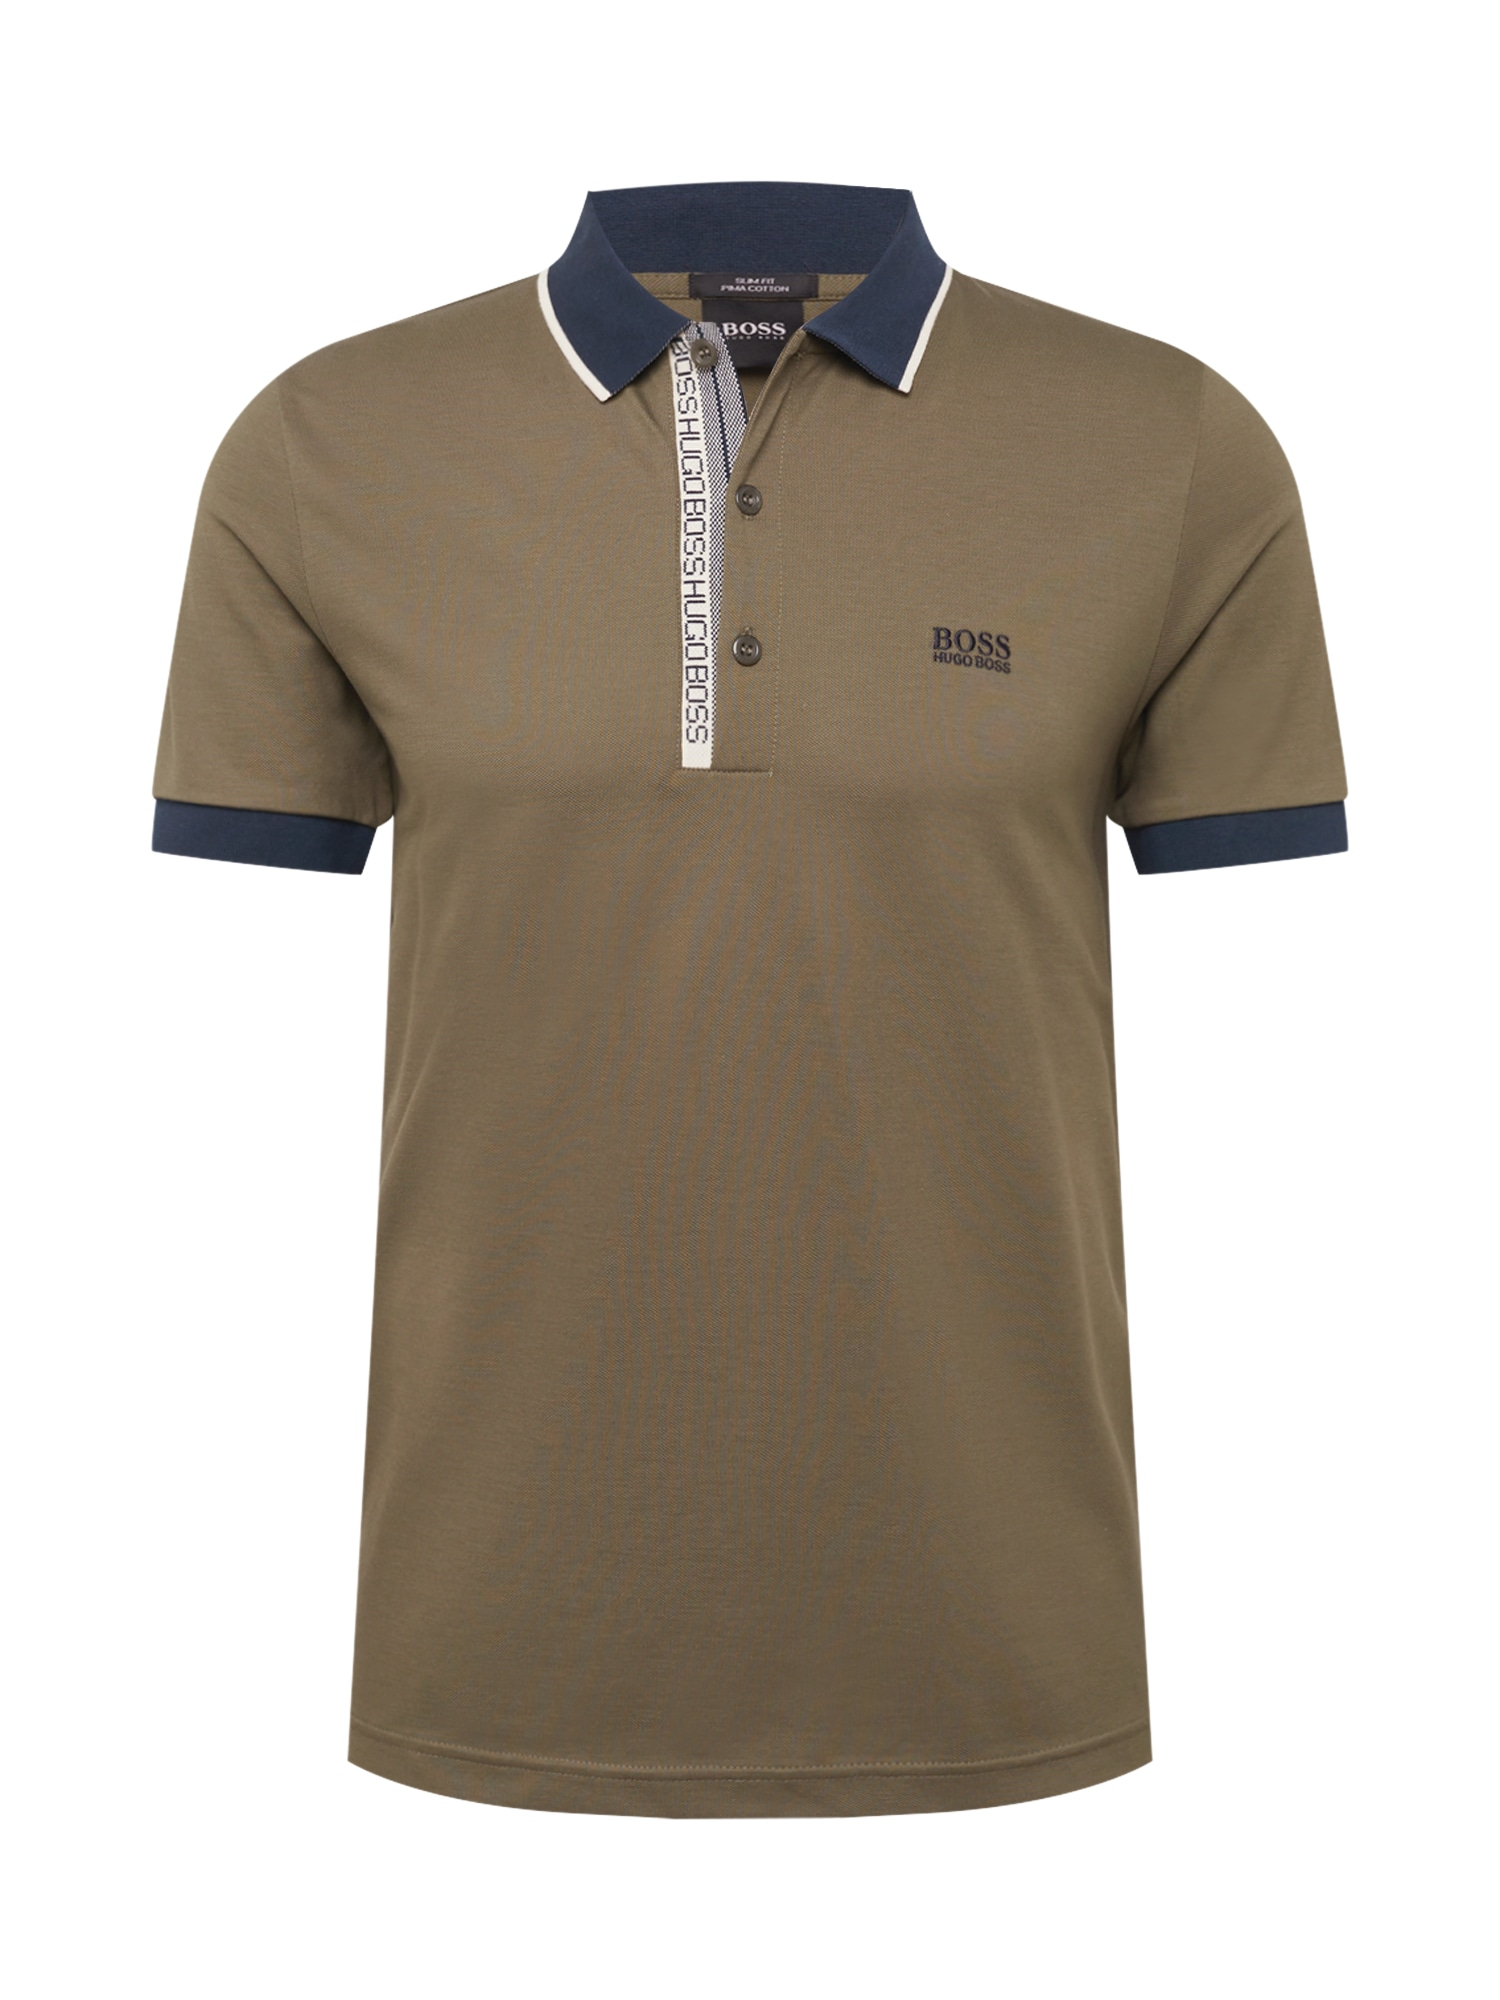 BOSS ATHLEISURE Tričko 'Paule '  khaki / námořnická modř / bílá